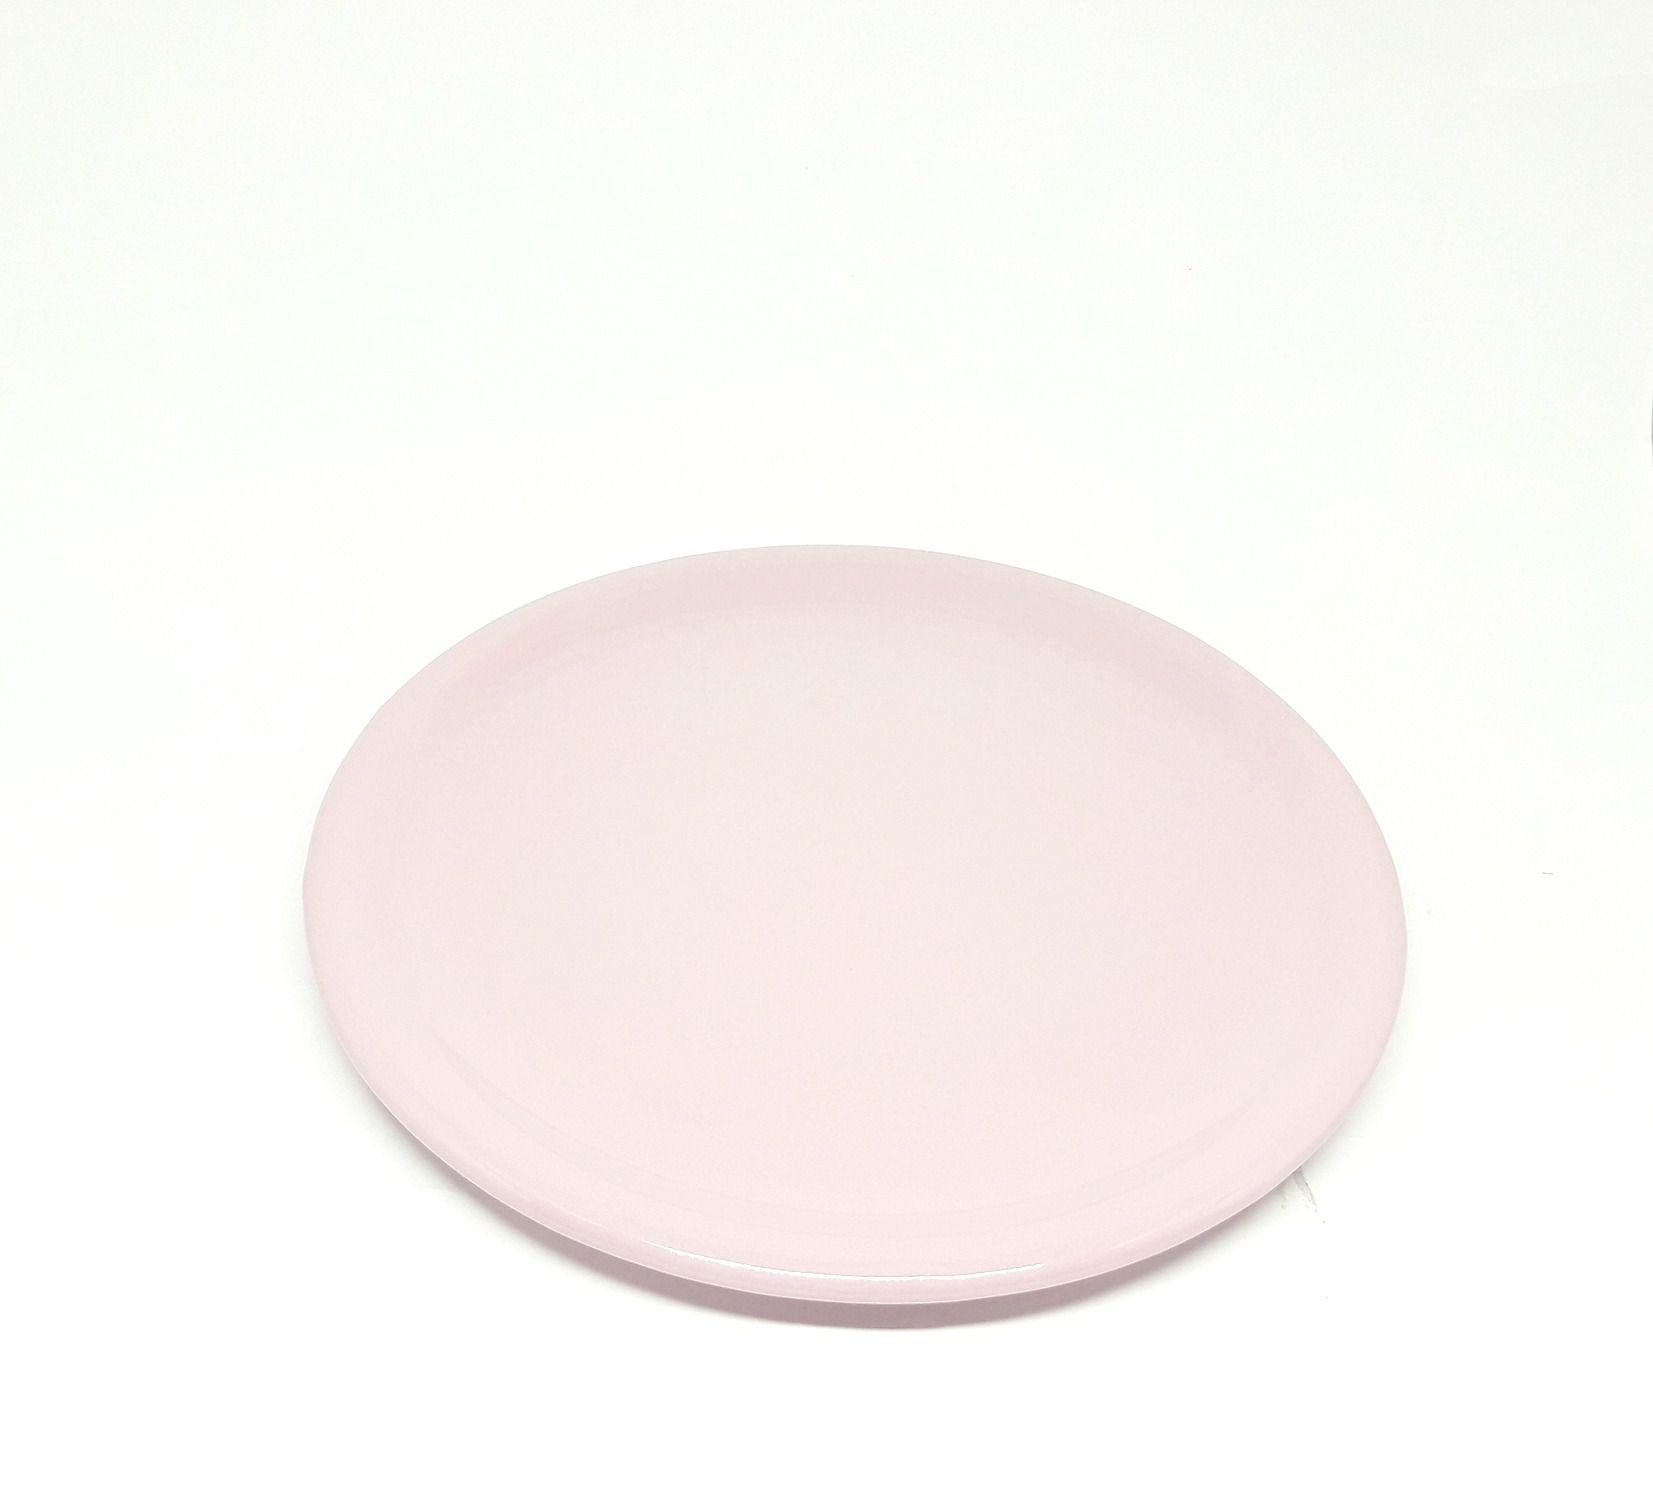 Bandeja Redonda em Cerâmica Rosa Bebê 30 cm